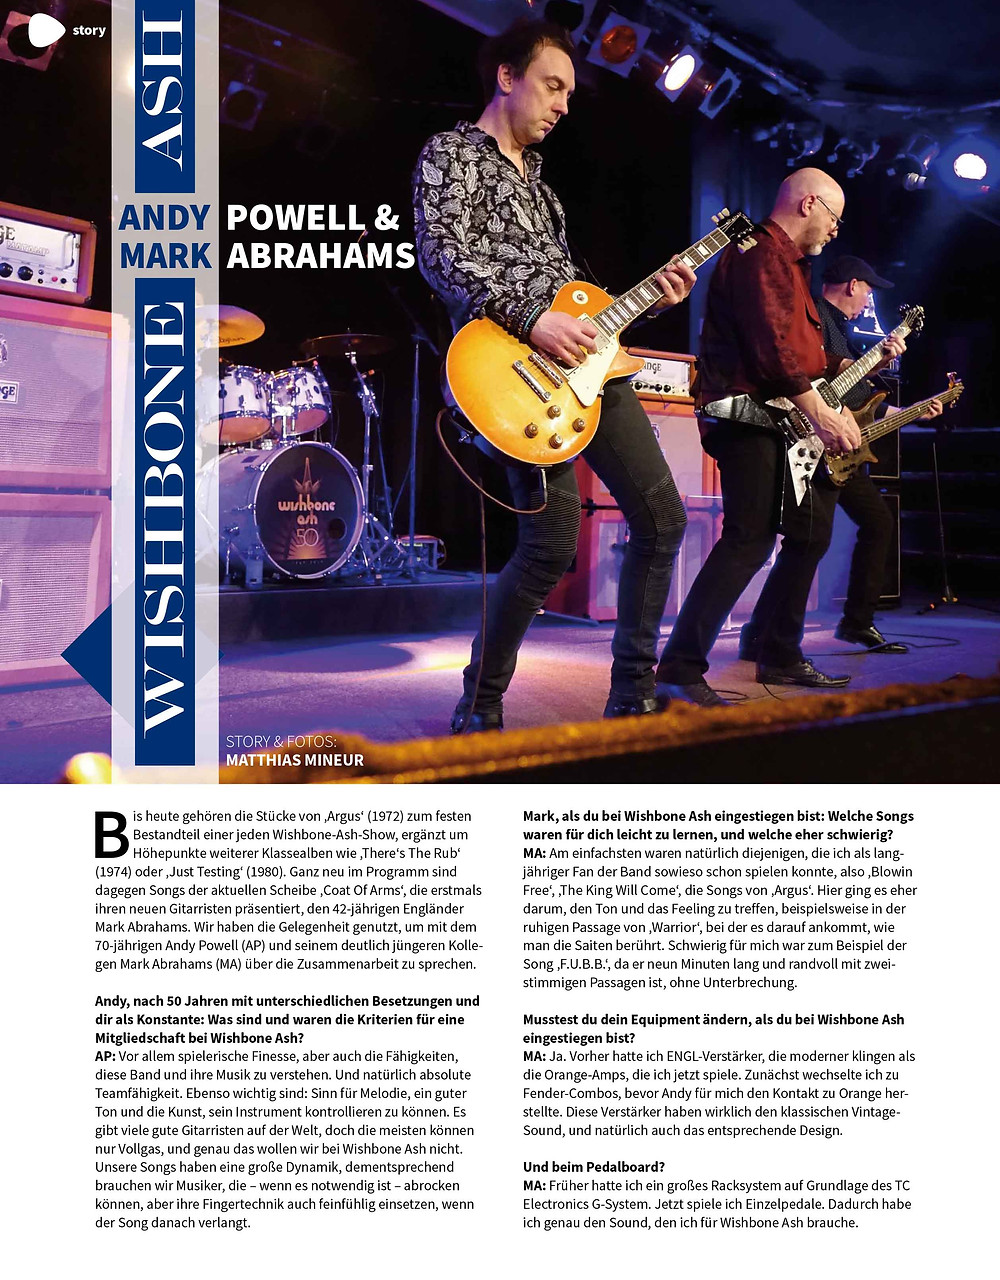 Wishbone Ash gitarre & bass magazine andy powell mark abrahams